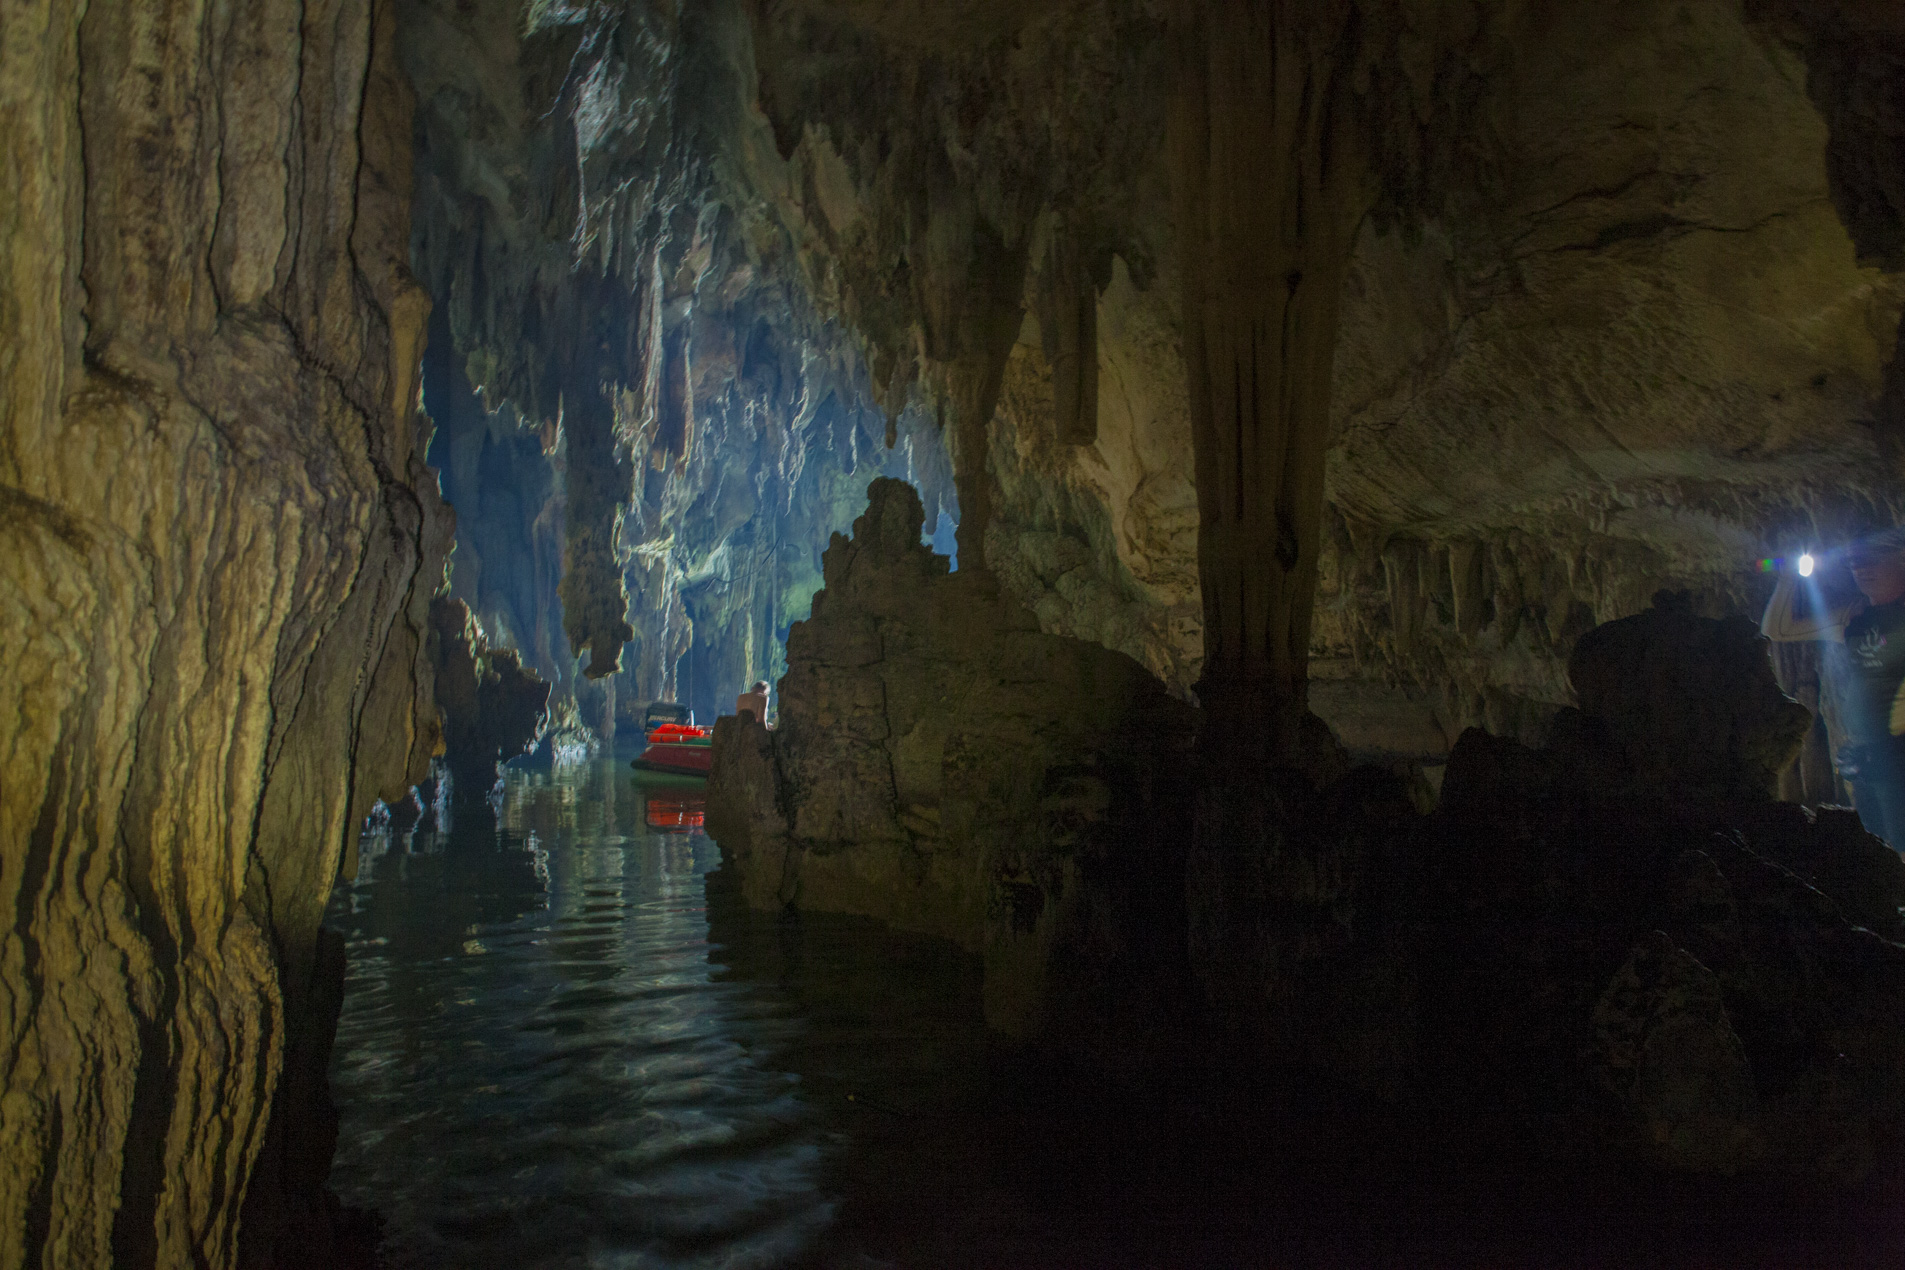 Cave in Misool